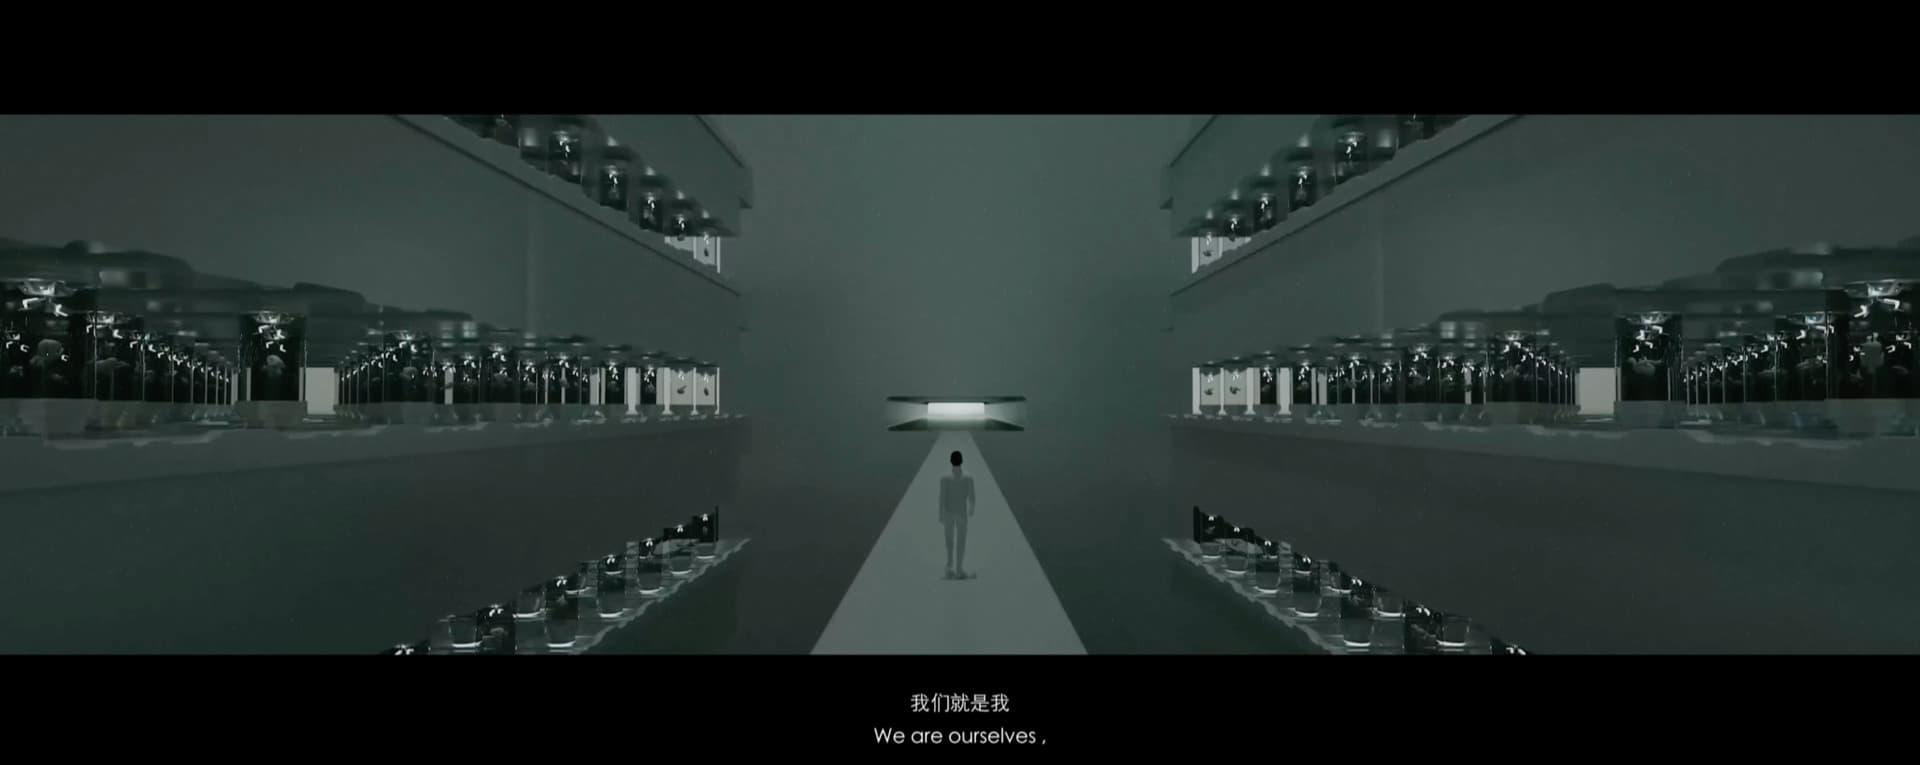 one-infinite2-film@2x